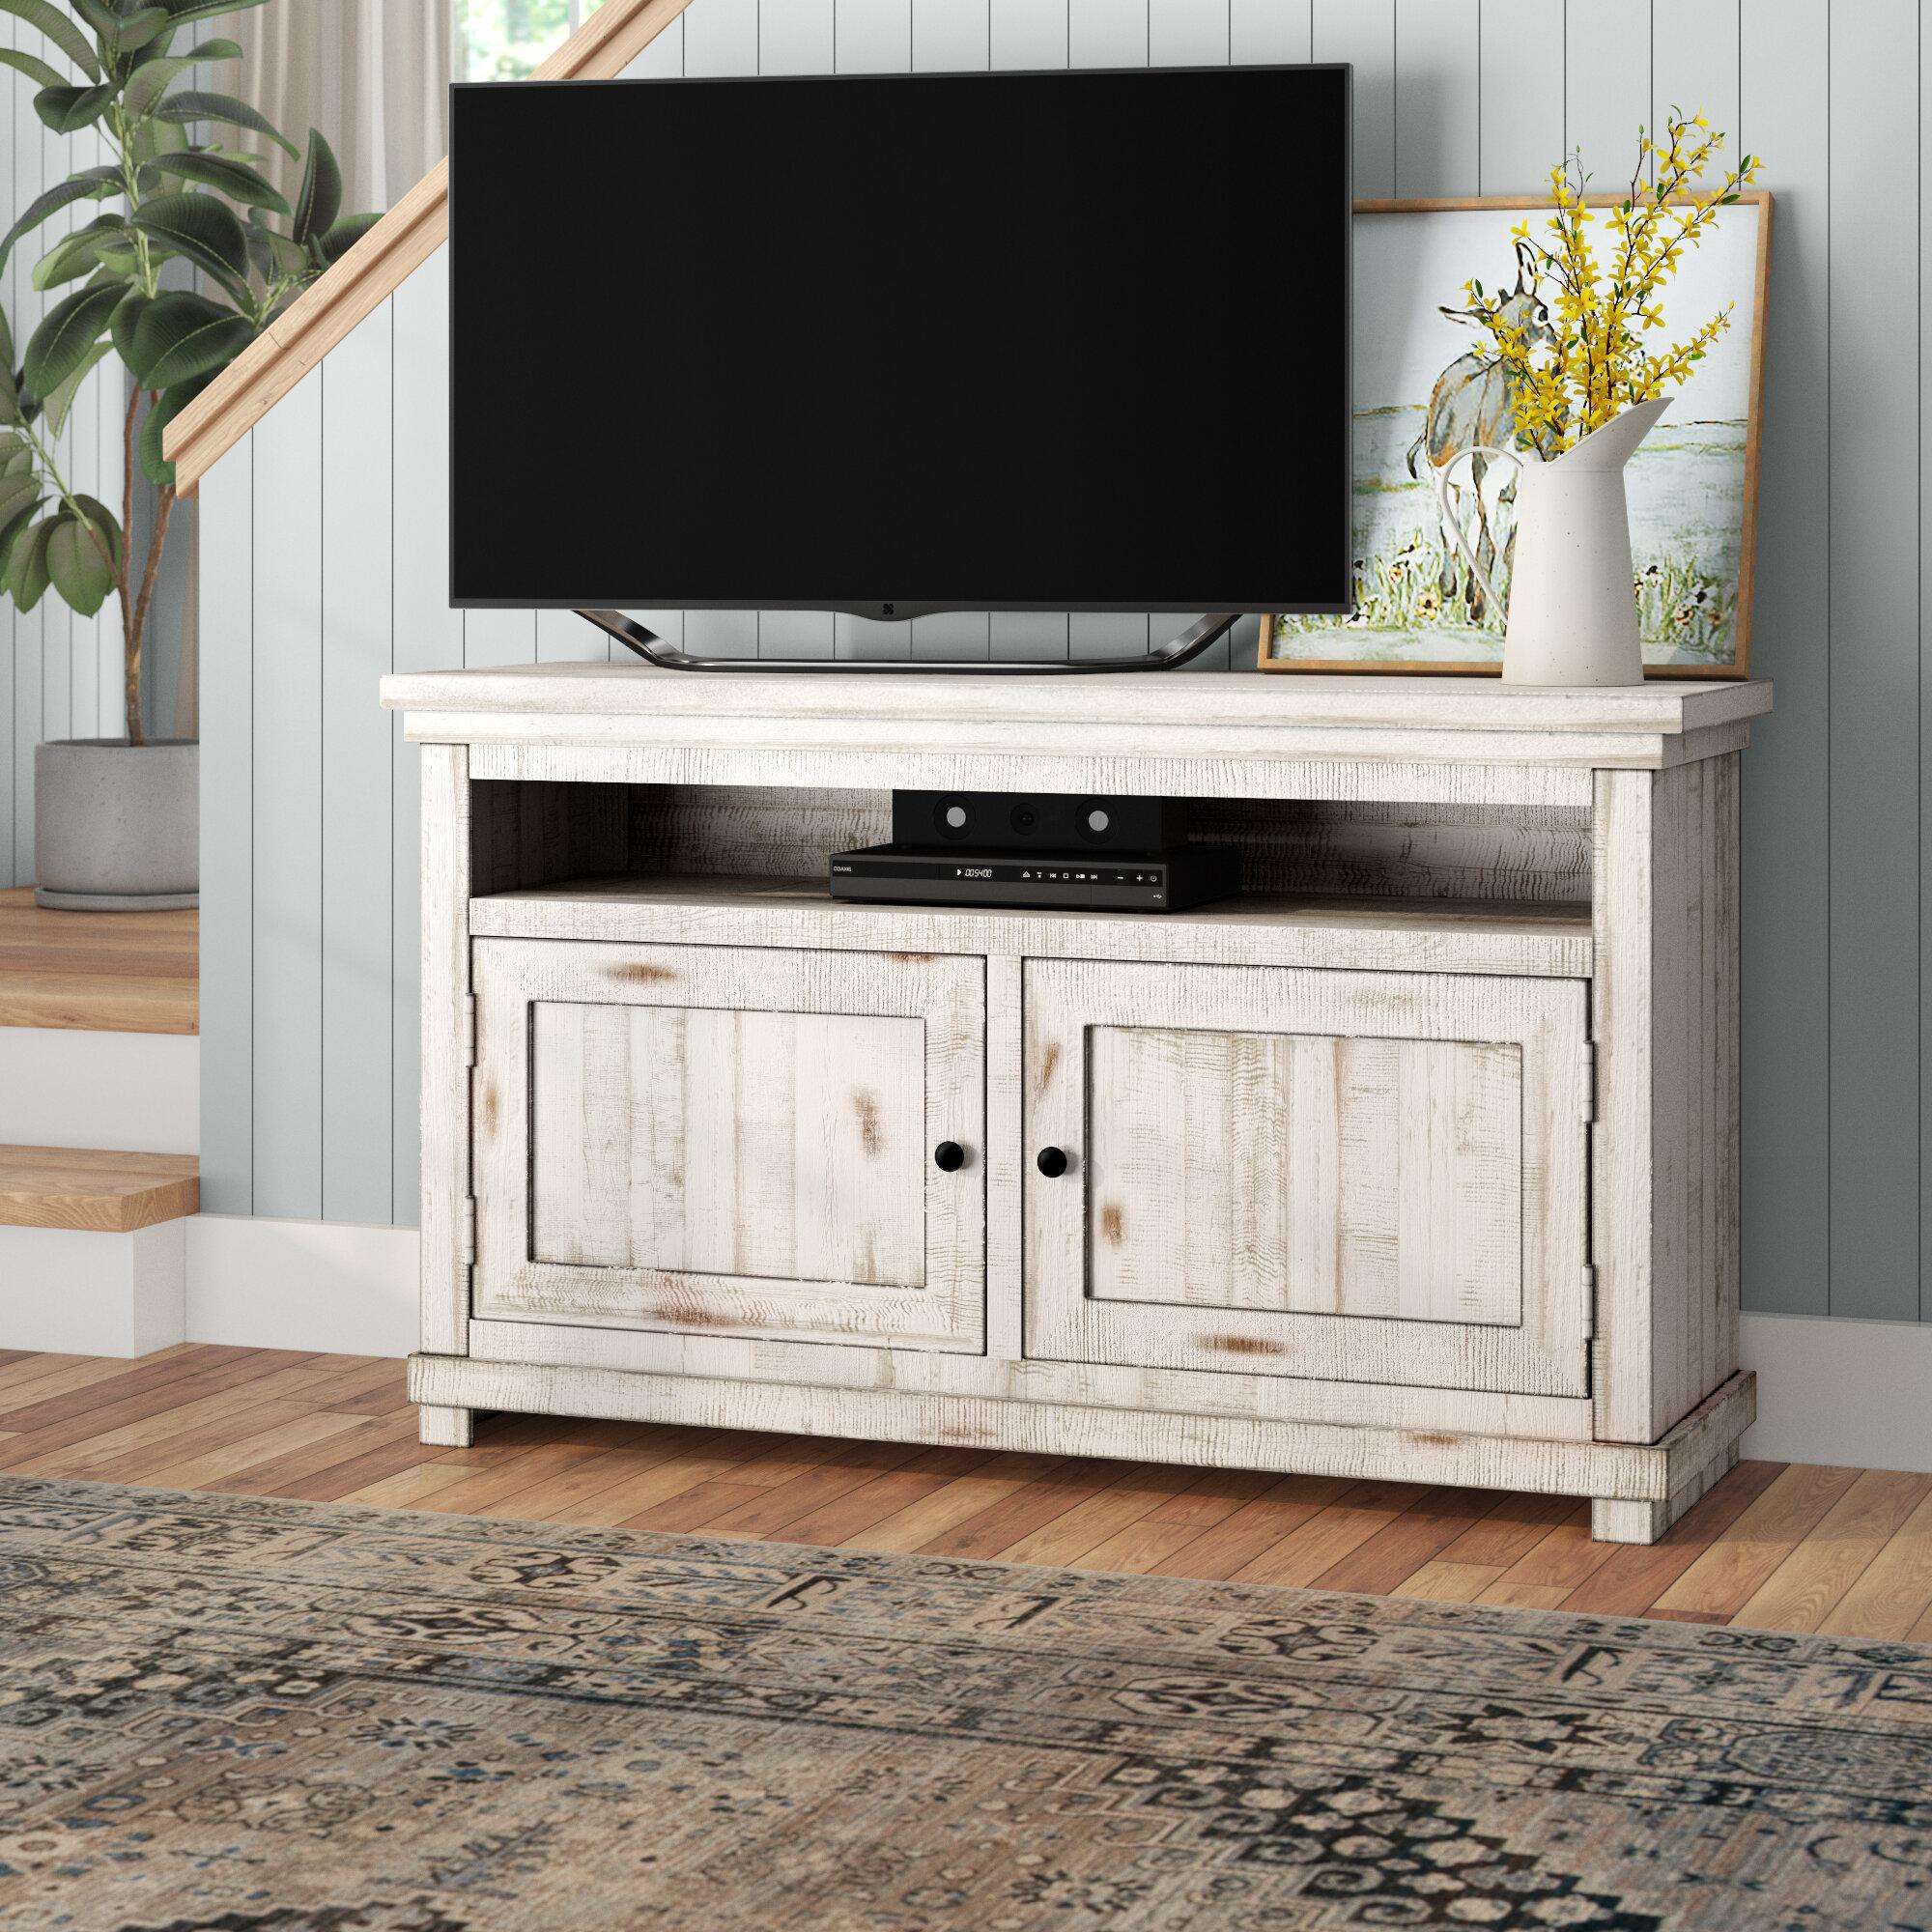 Greyleigh pineland tv stand reviews wayfair